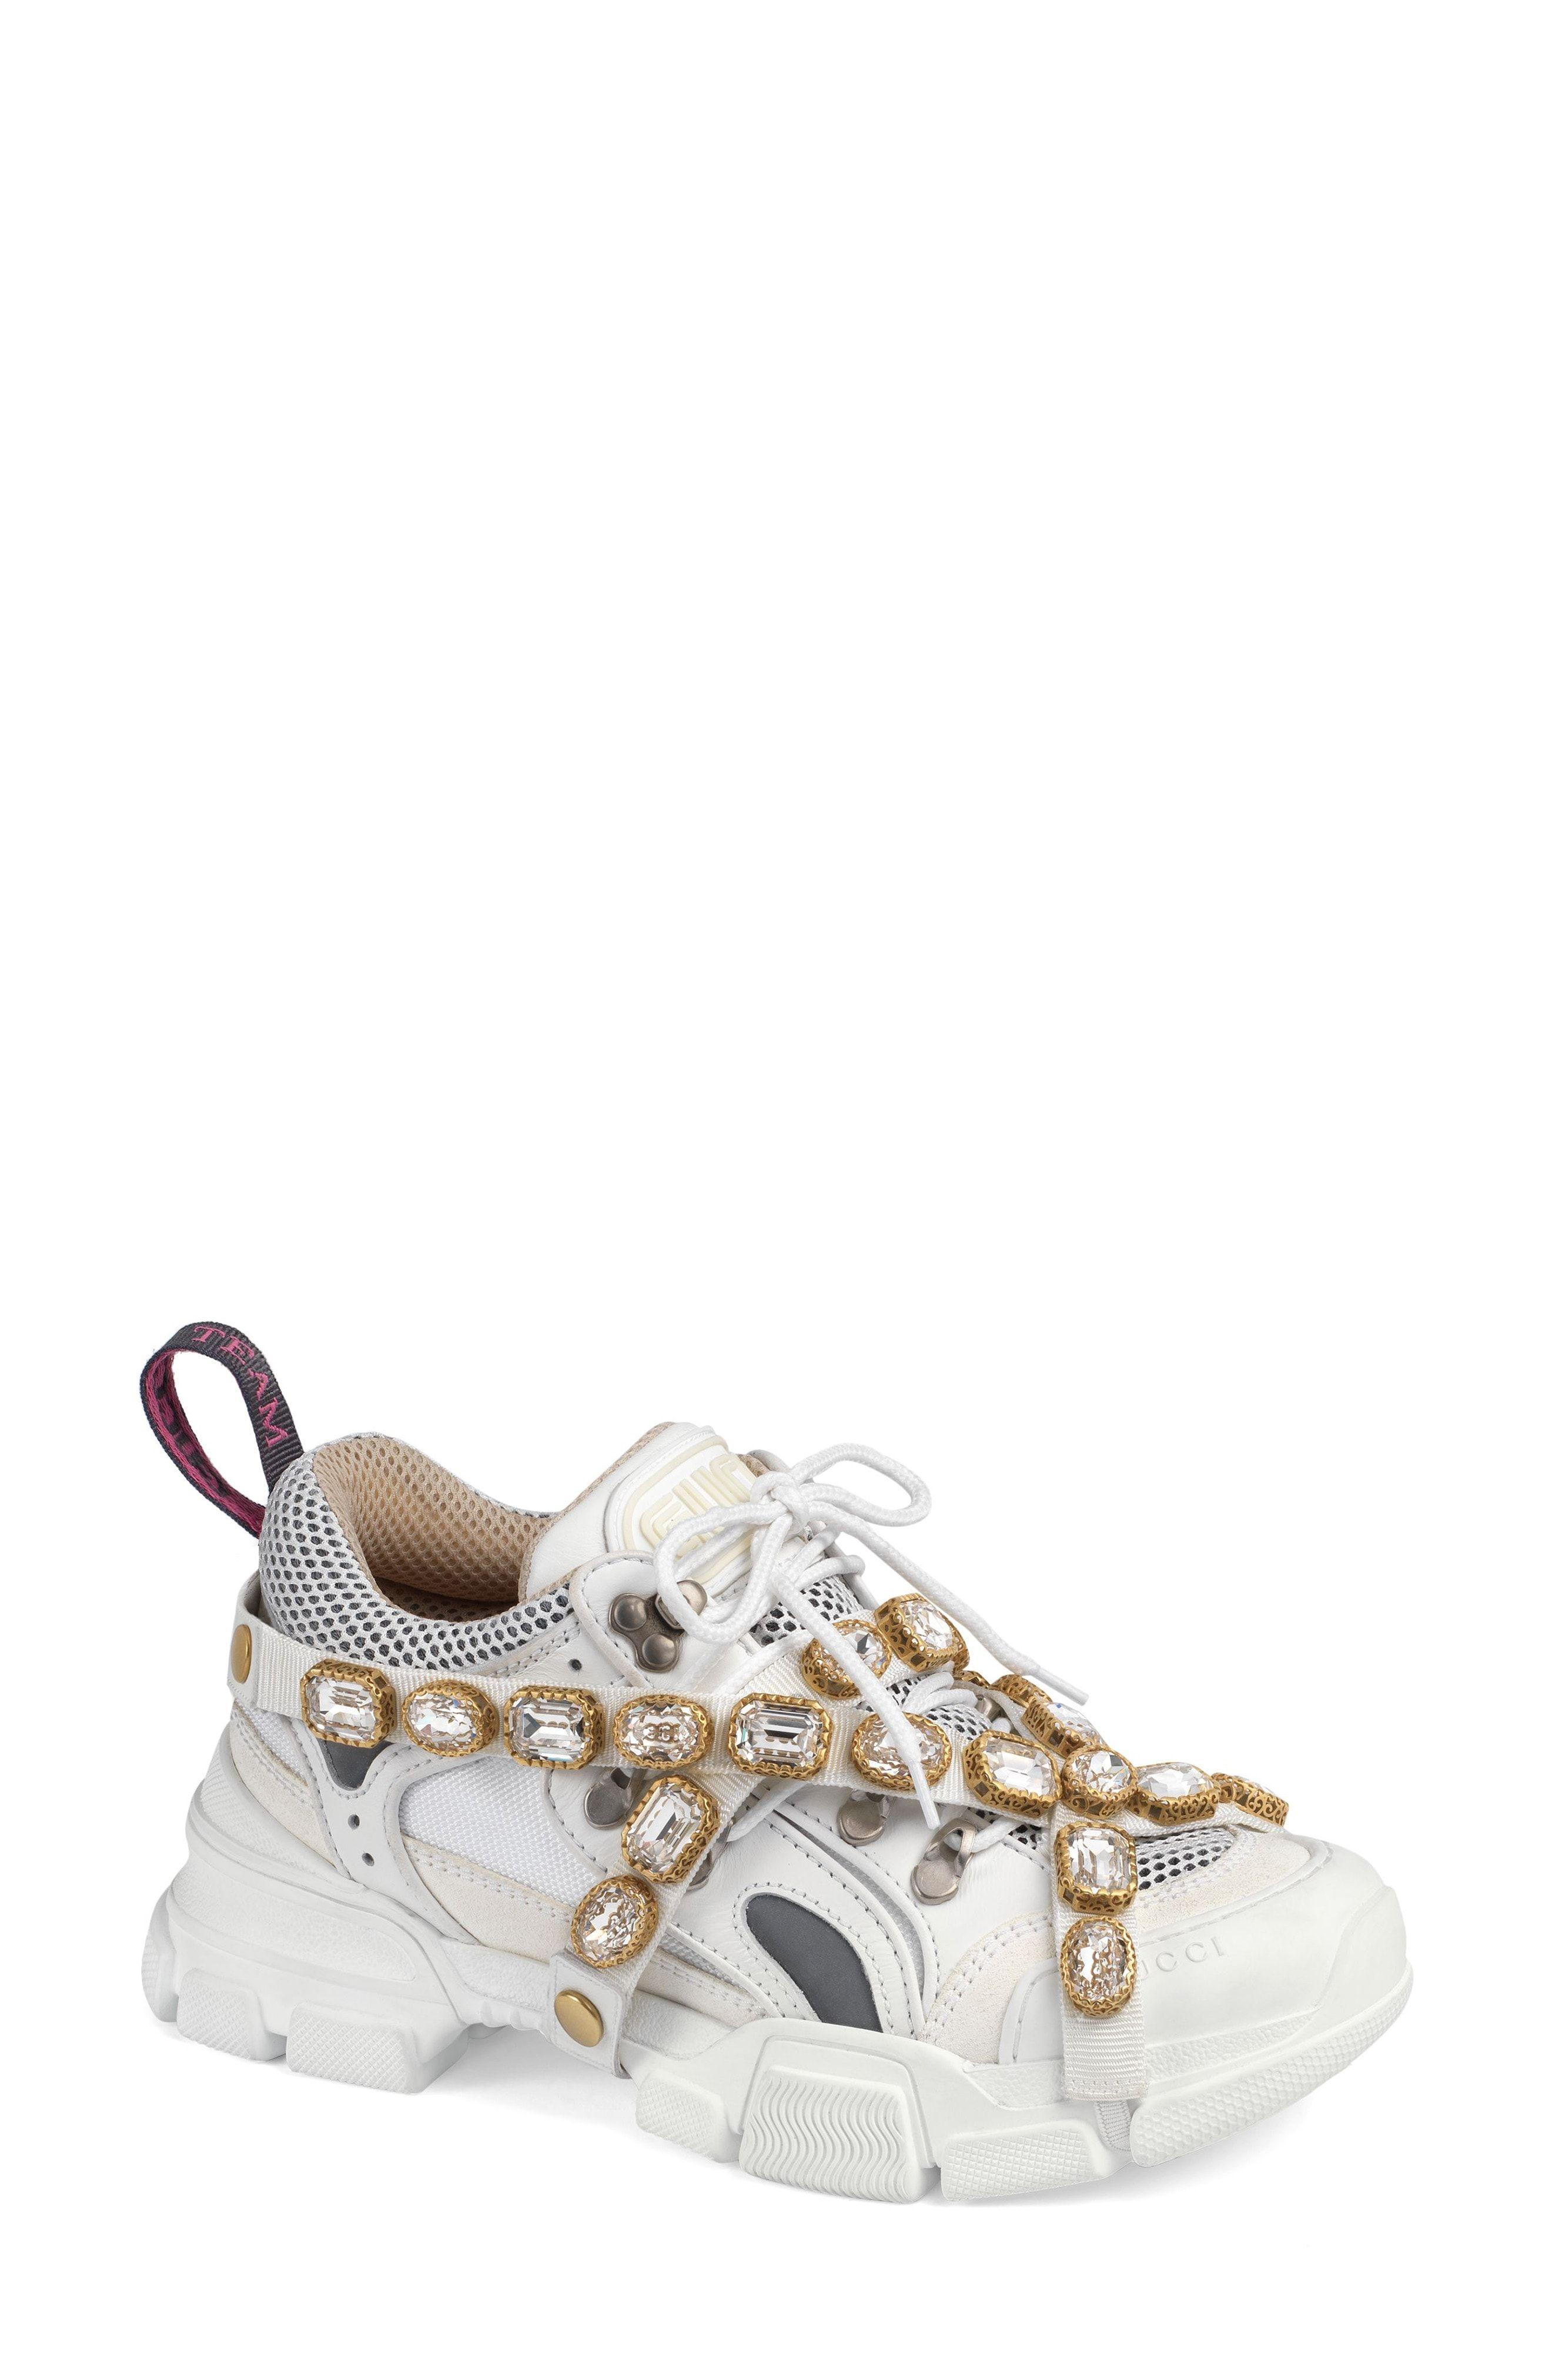 eb42d2f9b Gucci Journey Jewel Embellished Sneaker (Women) | #STYLECHAT STYLE ...